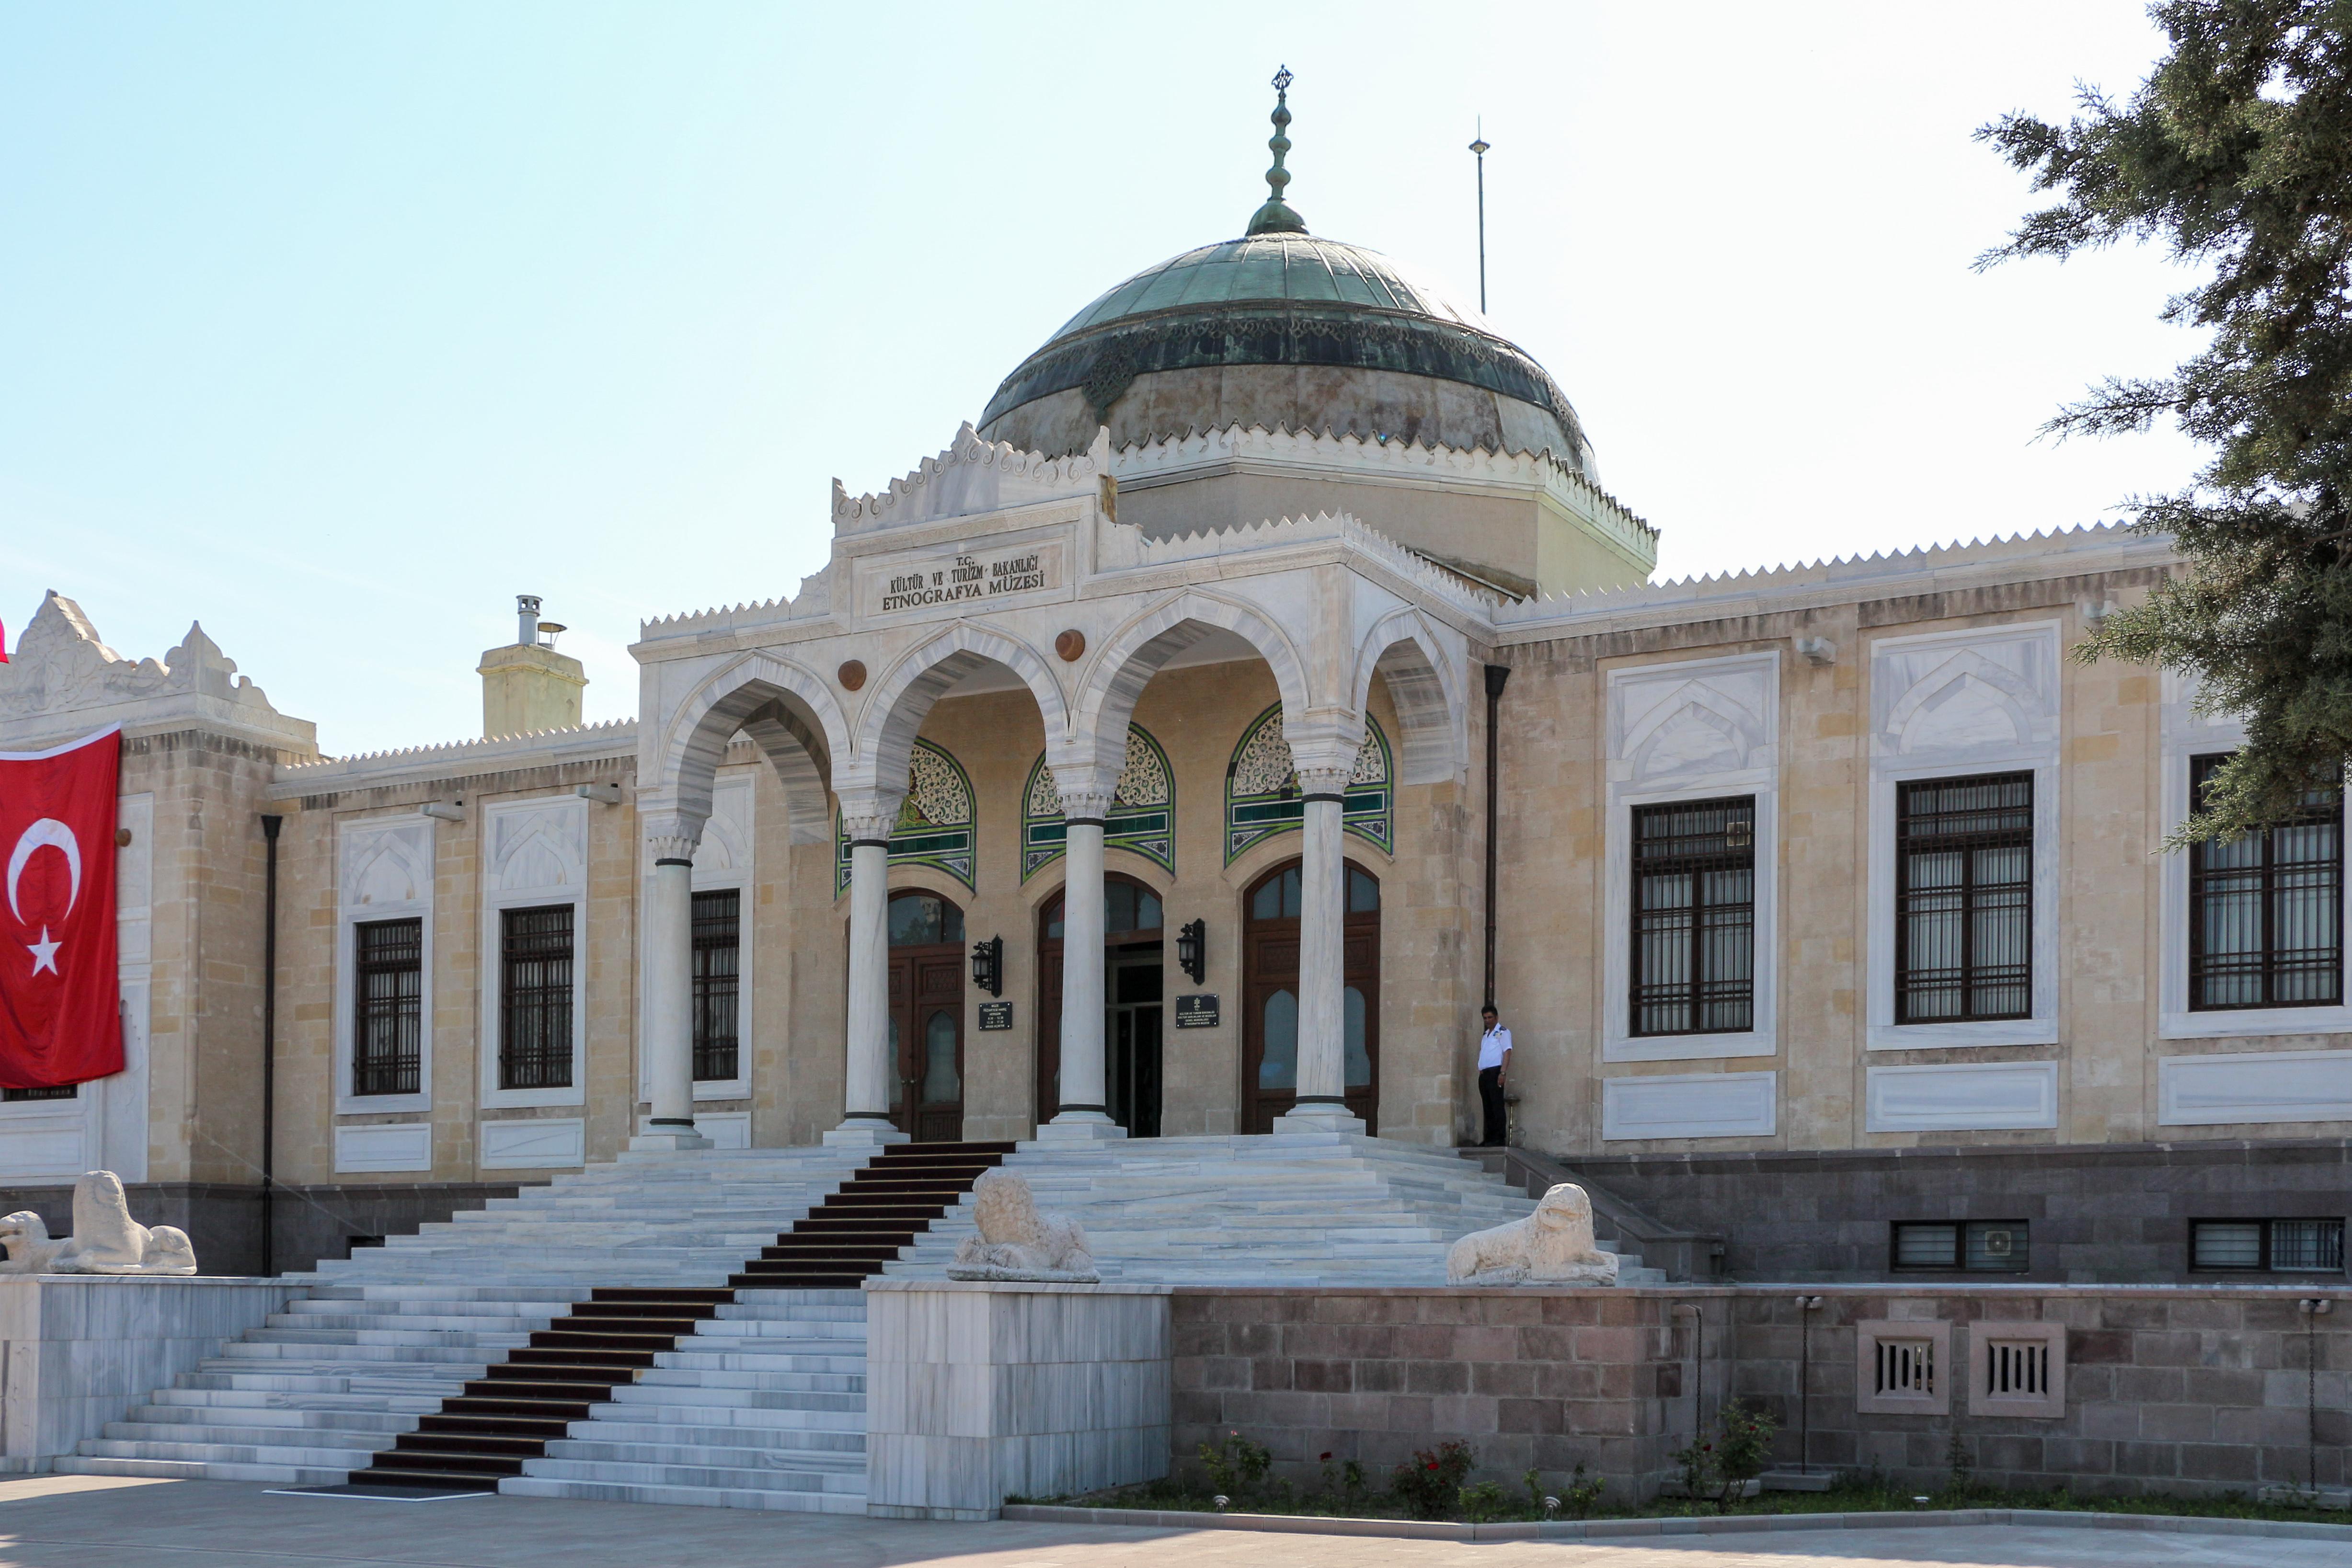 Ethnography Museum of Ankara - Wikiwand